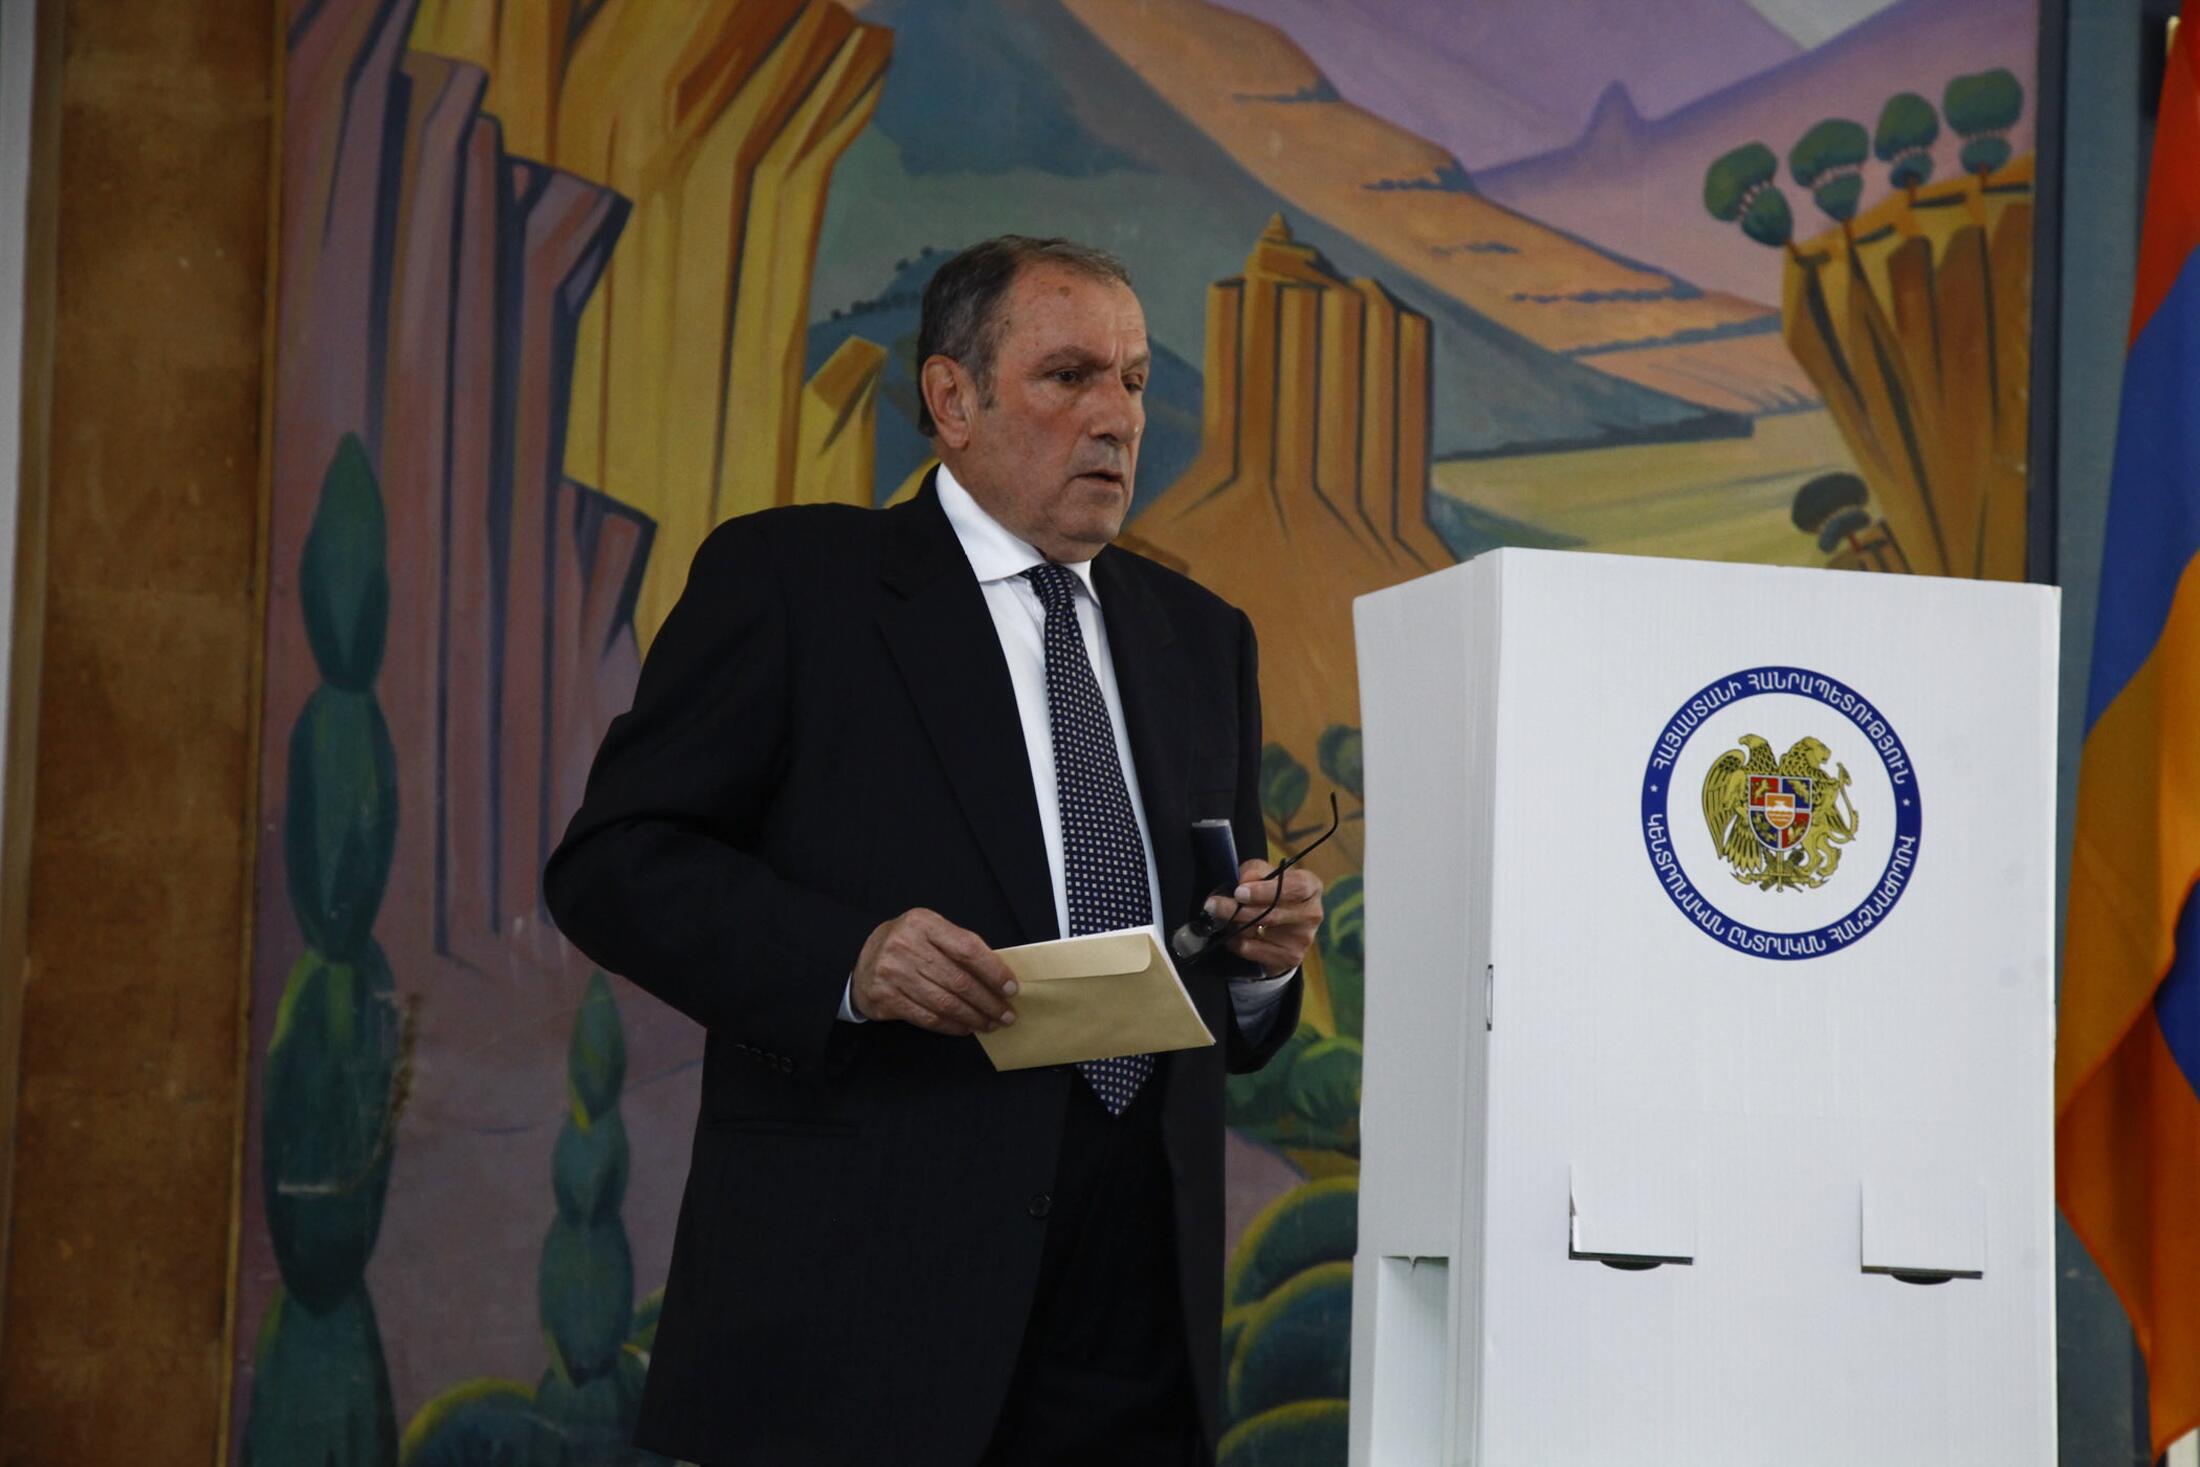 Лидер АНК, Левон Тер-Петросян на избирательном участке в Ереване 06/05/2012